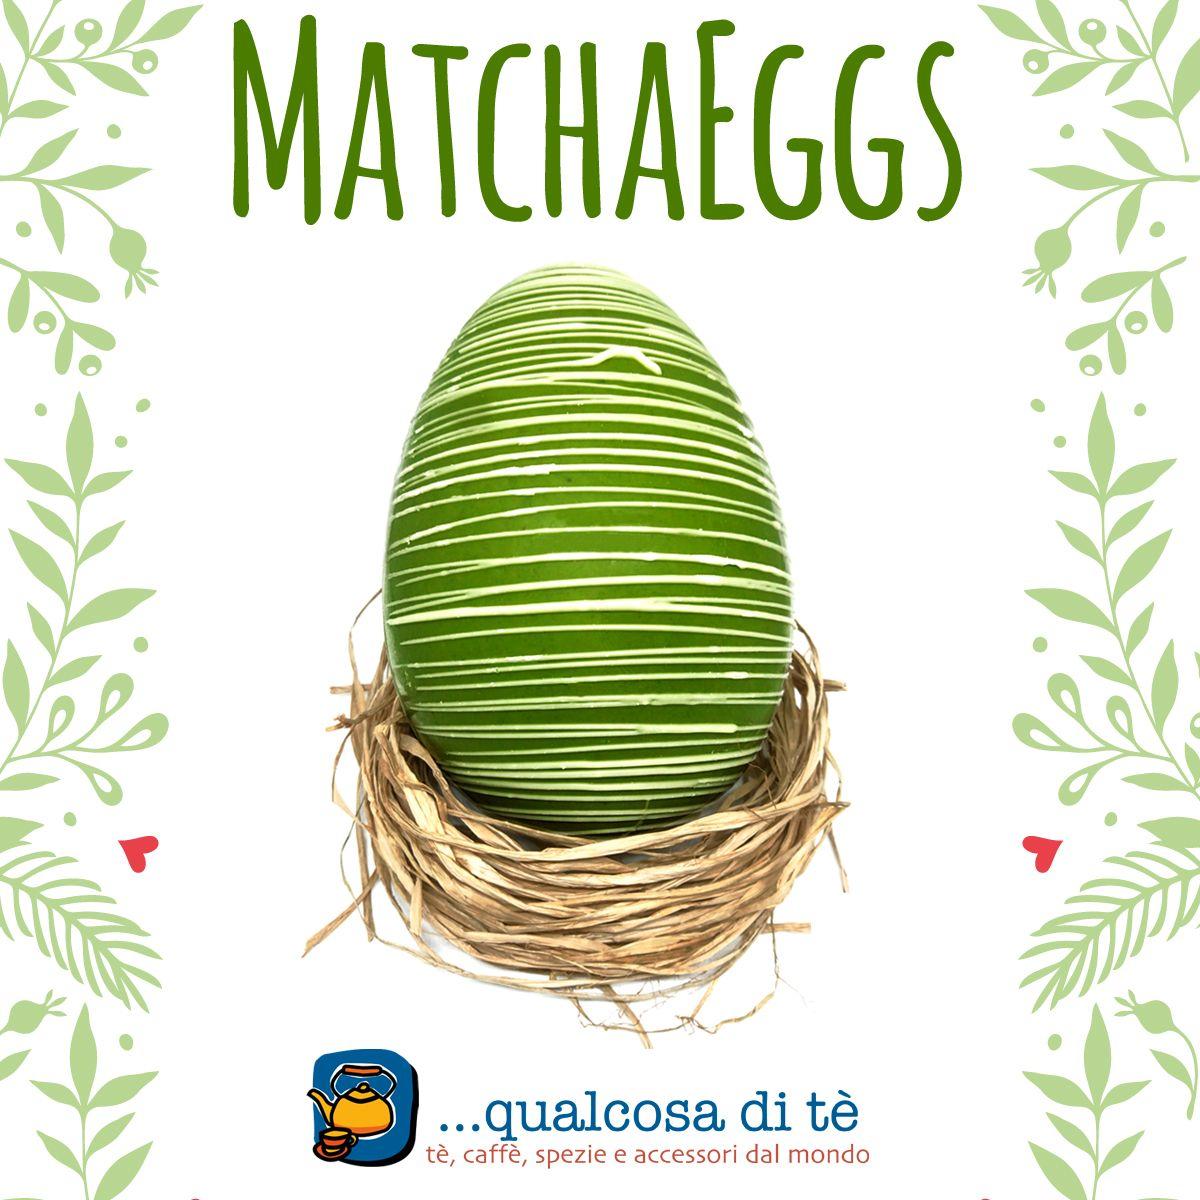 MatchaEggs